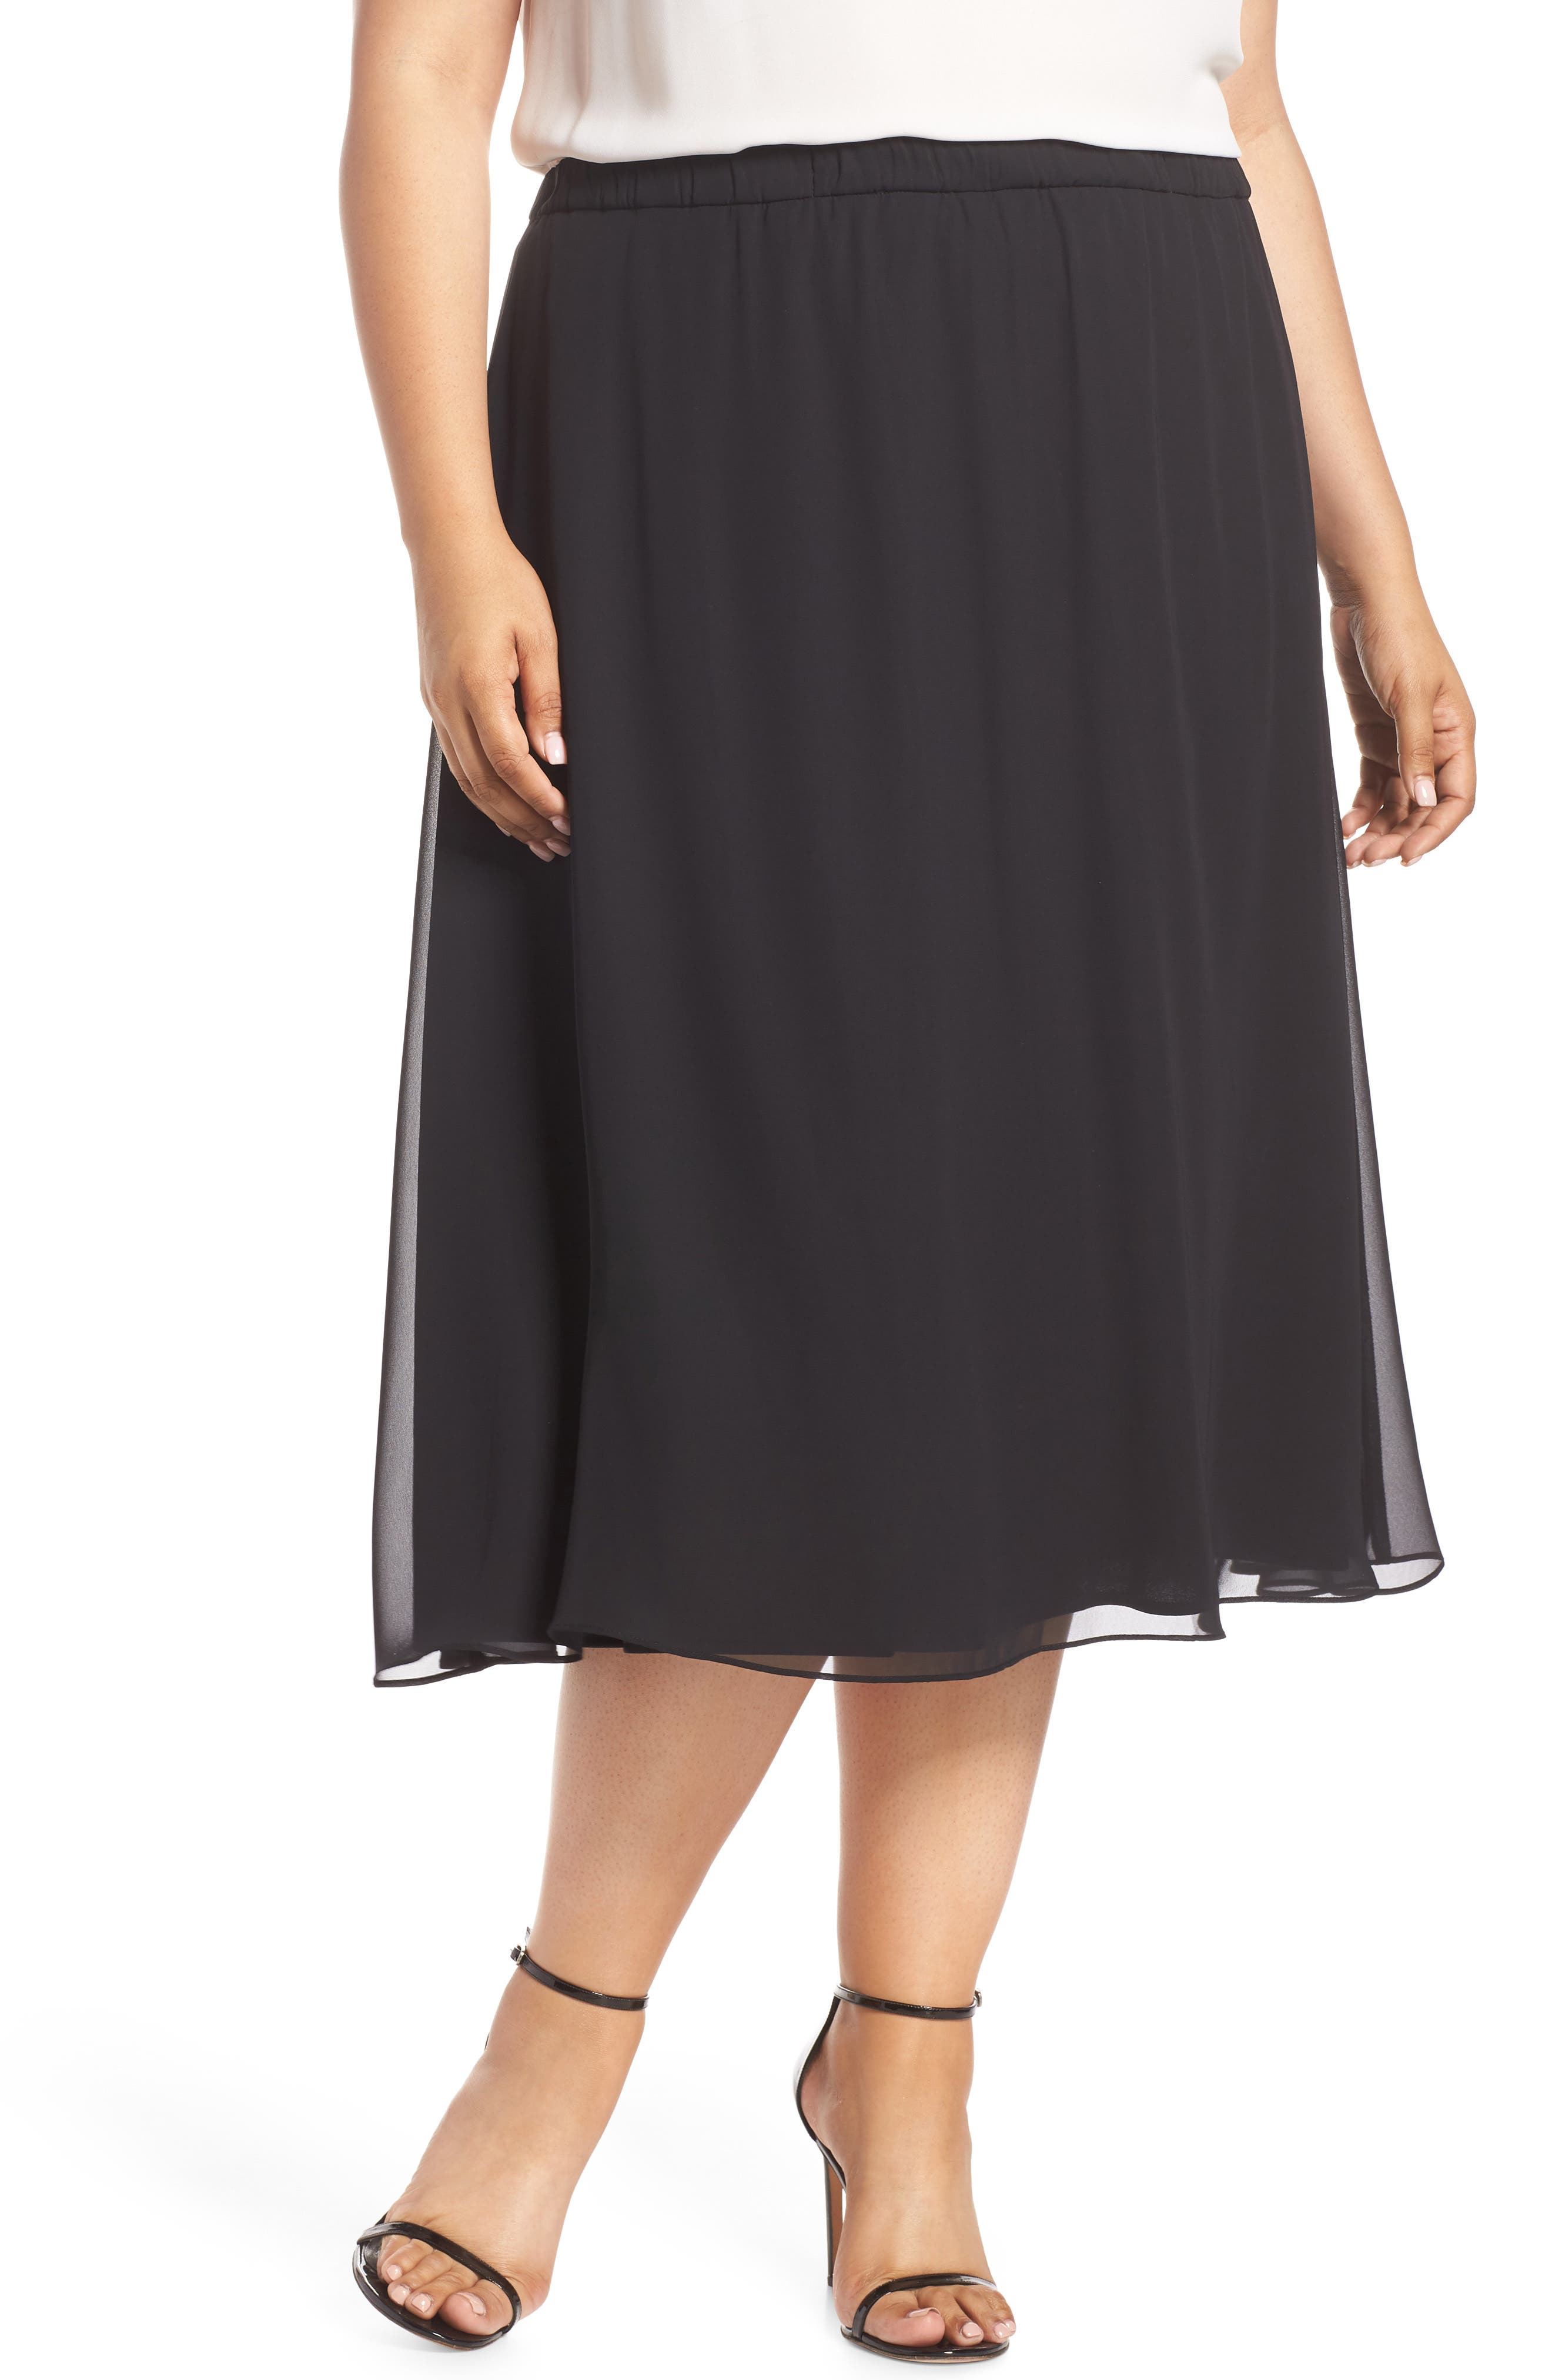 Plus Size Alex Evenings Chiffon A-Line Skirt, Black